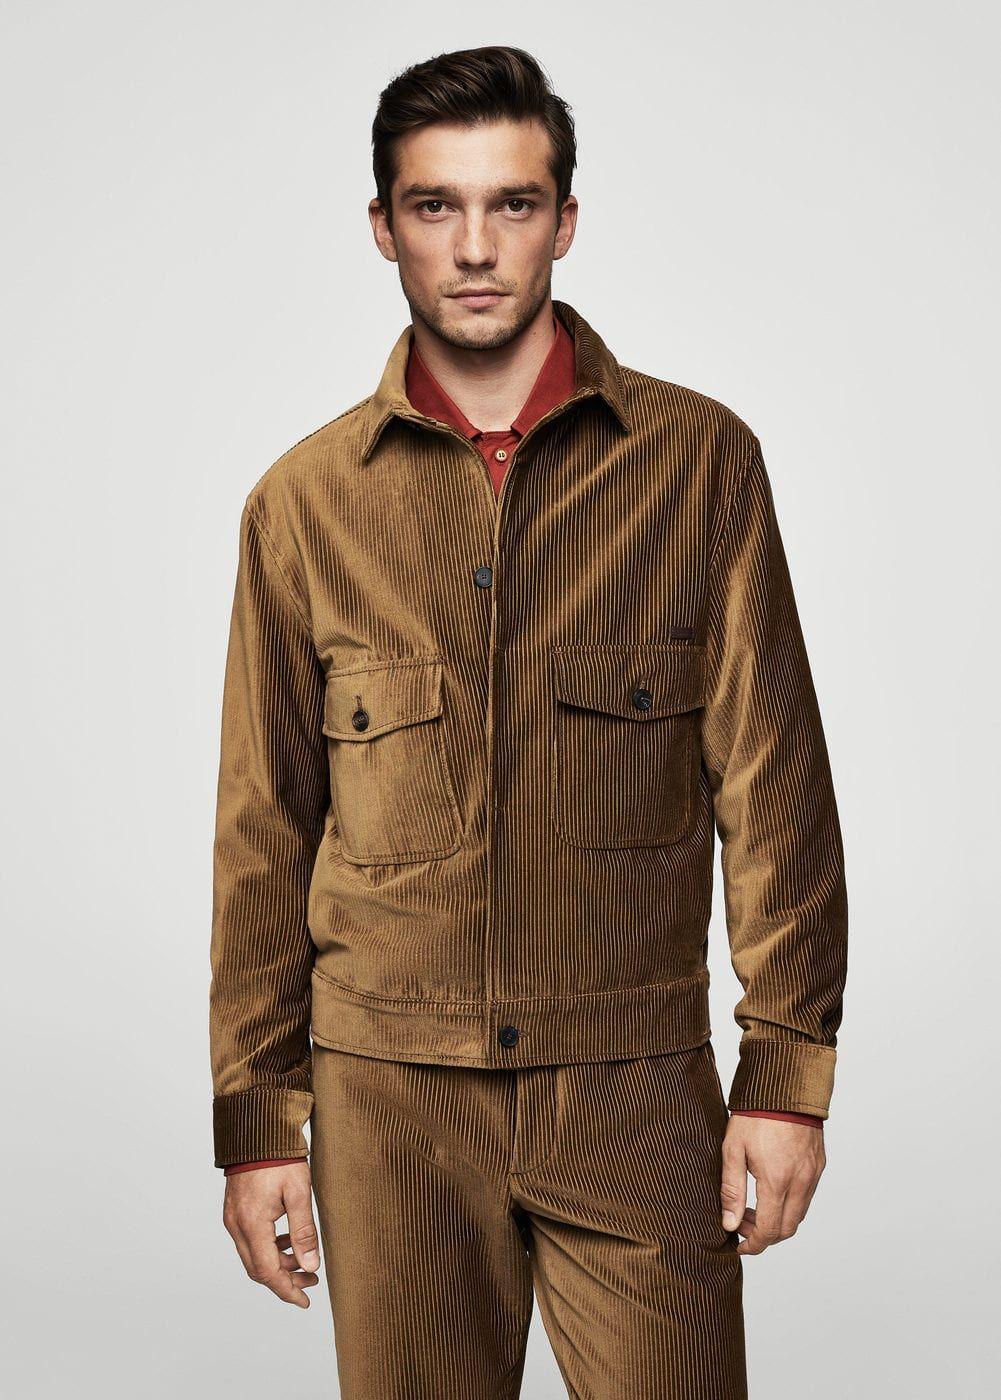 Corduroy organic cotton jacket Men Cotton jacket